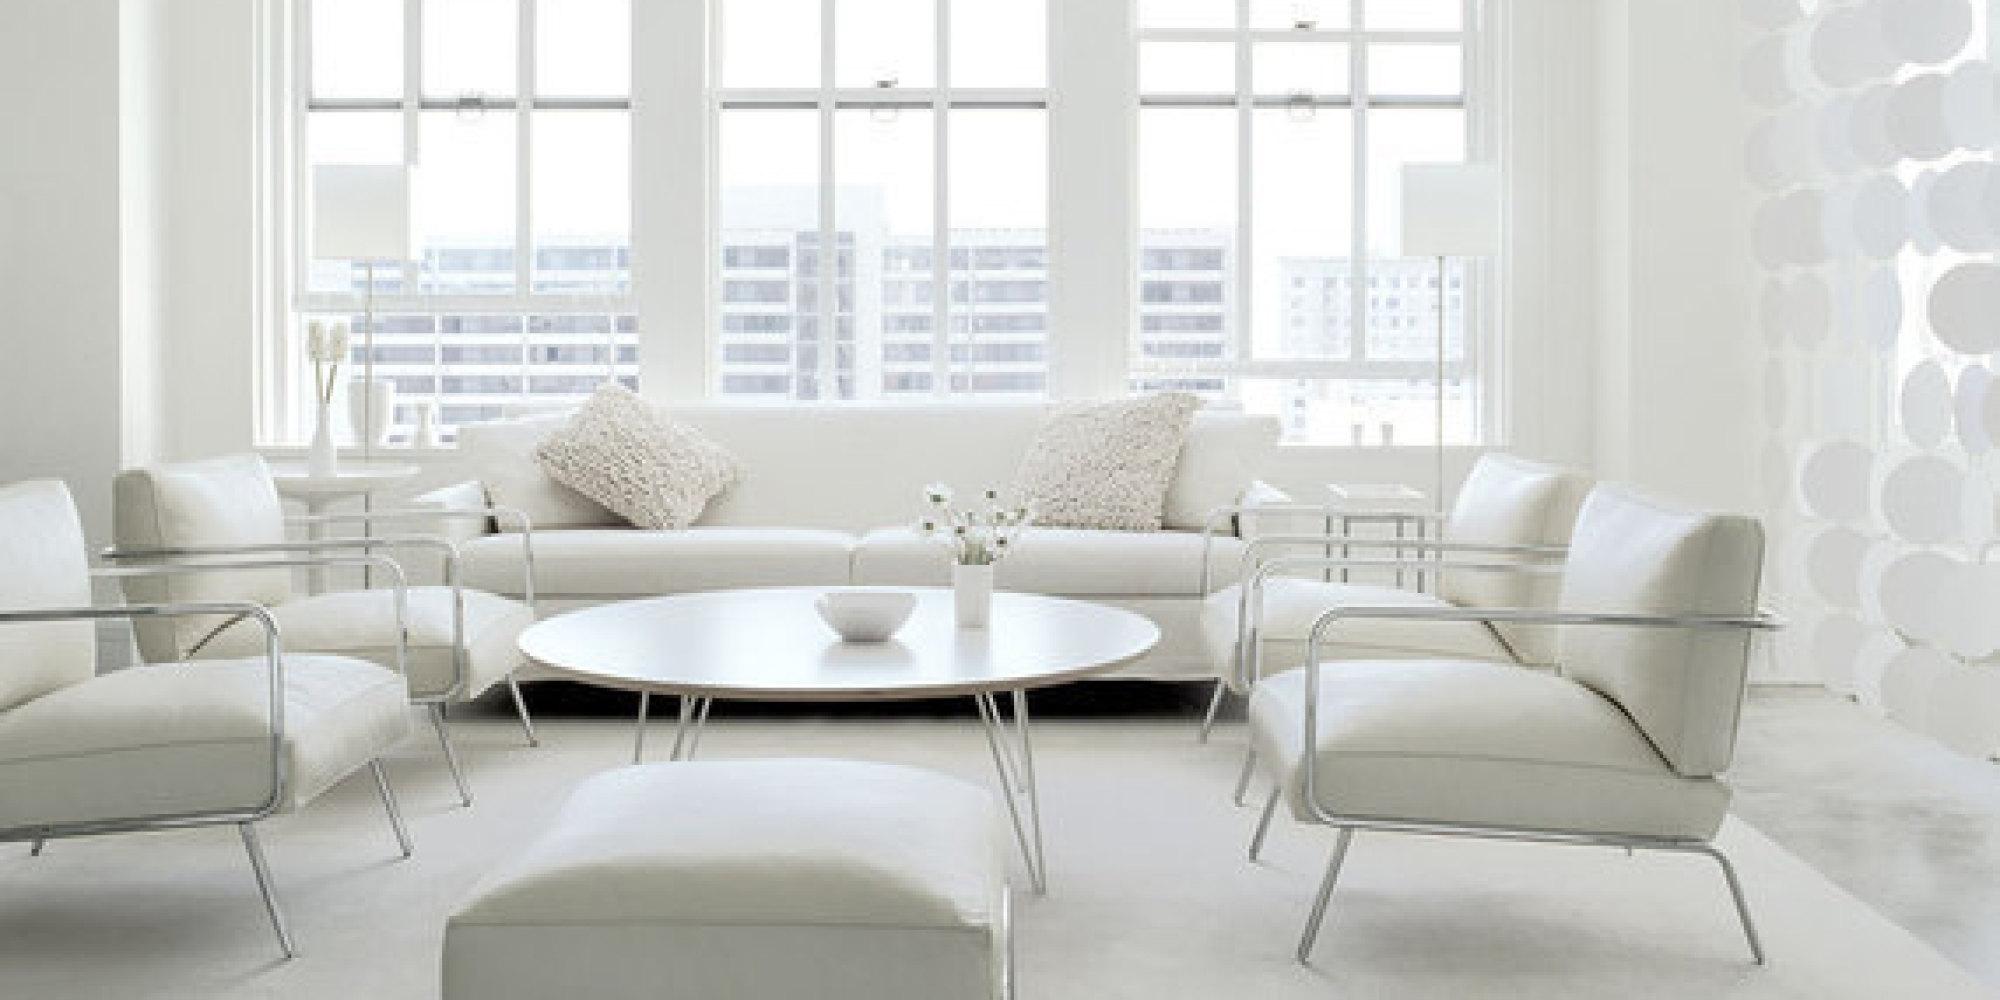 Black and White Contemporary Interior Design Ideas for ...